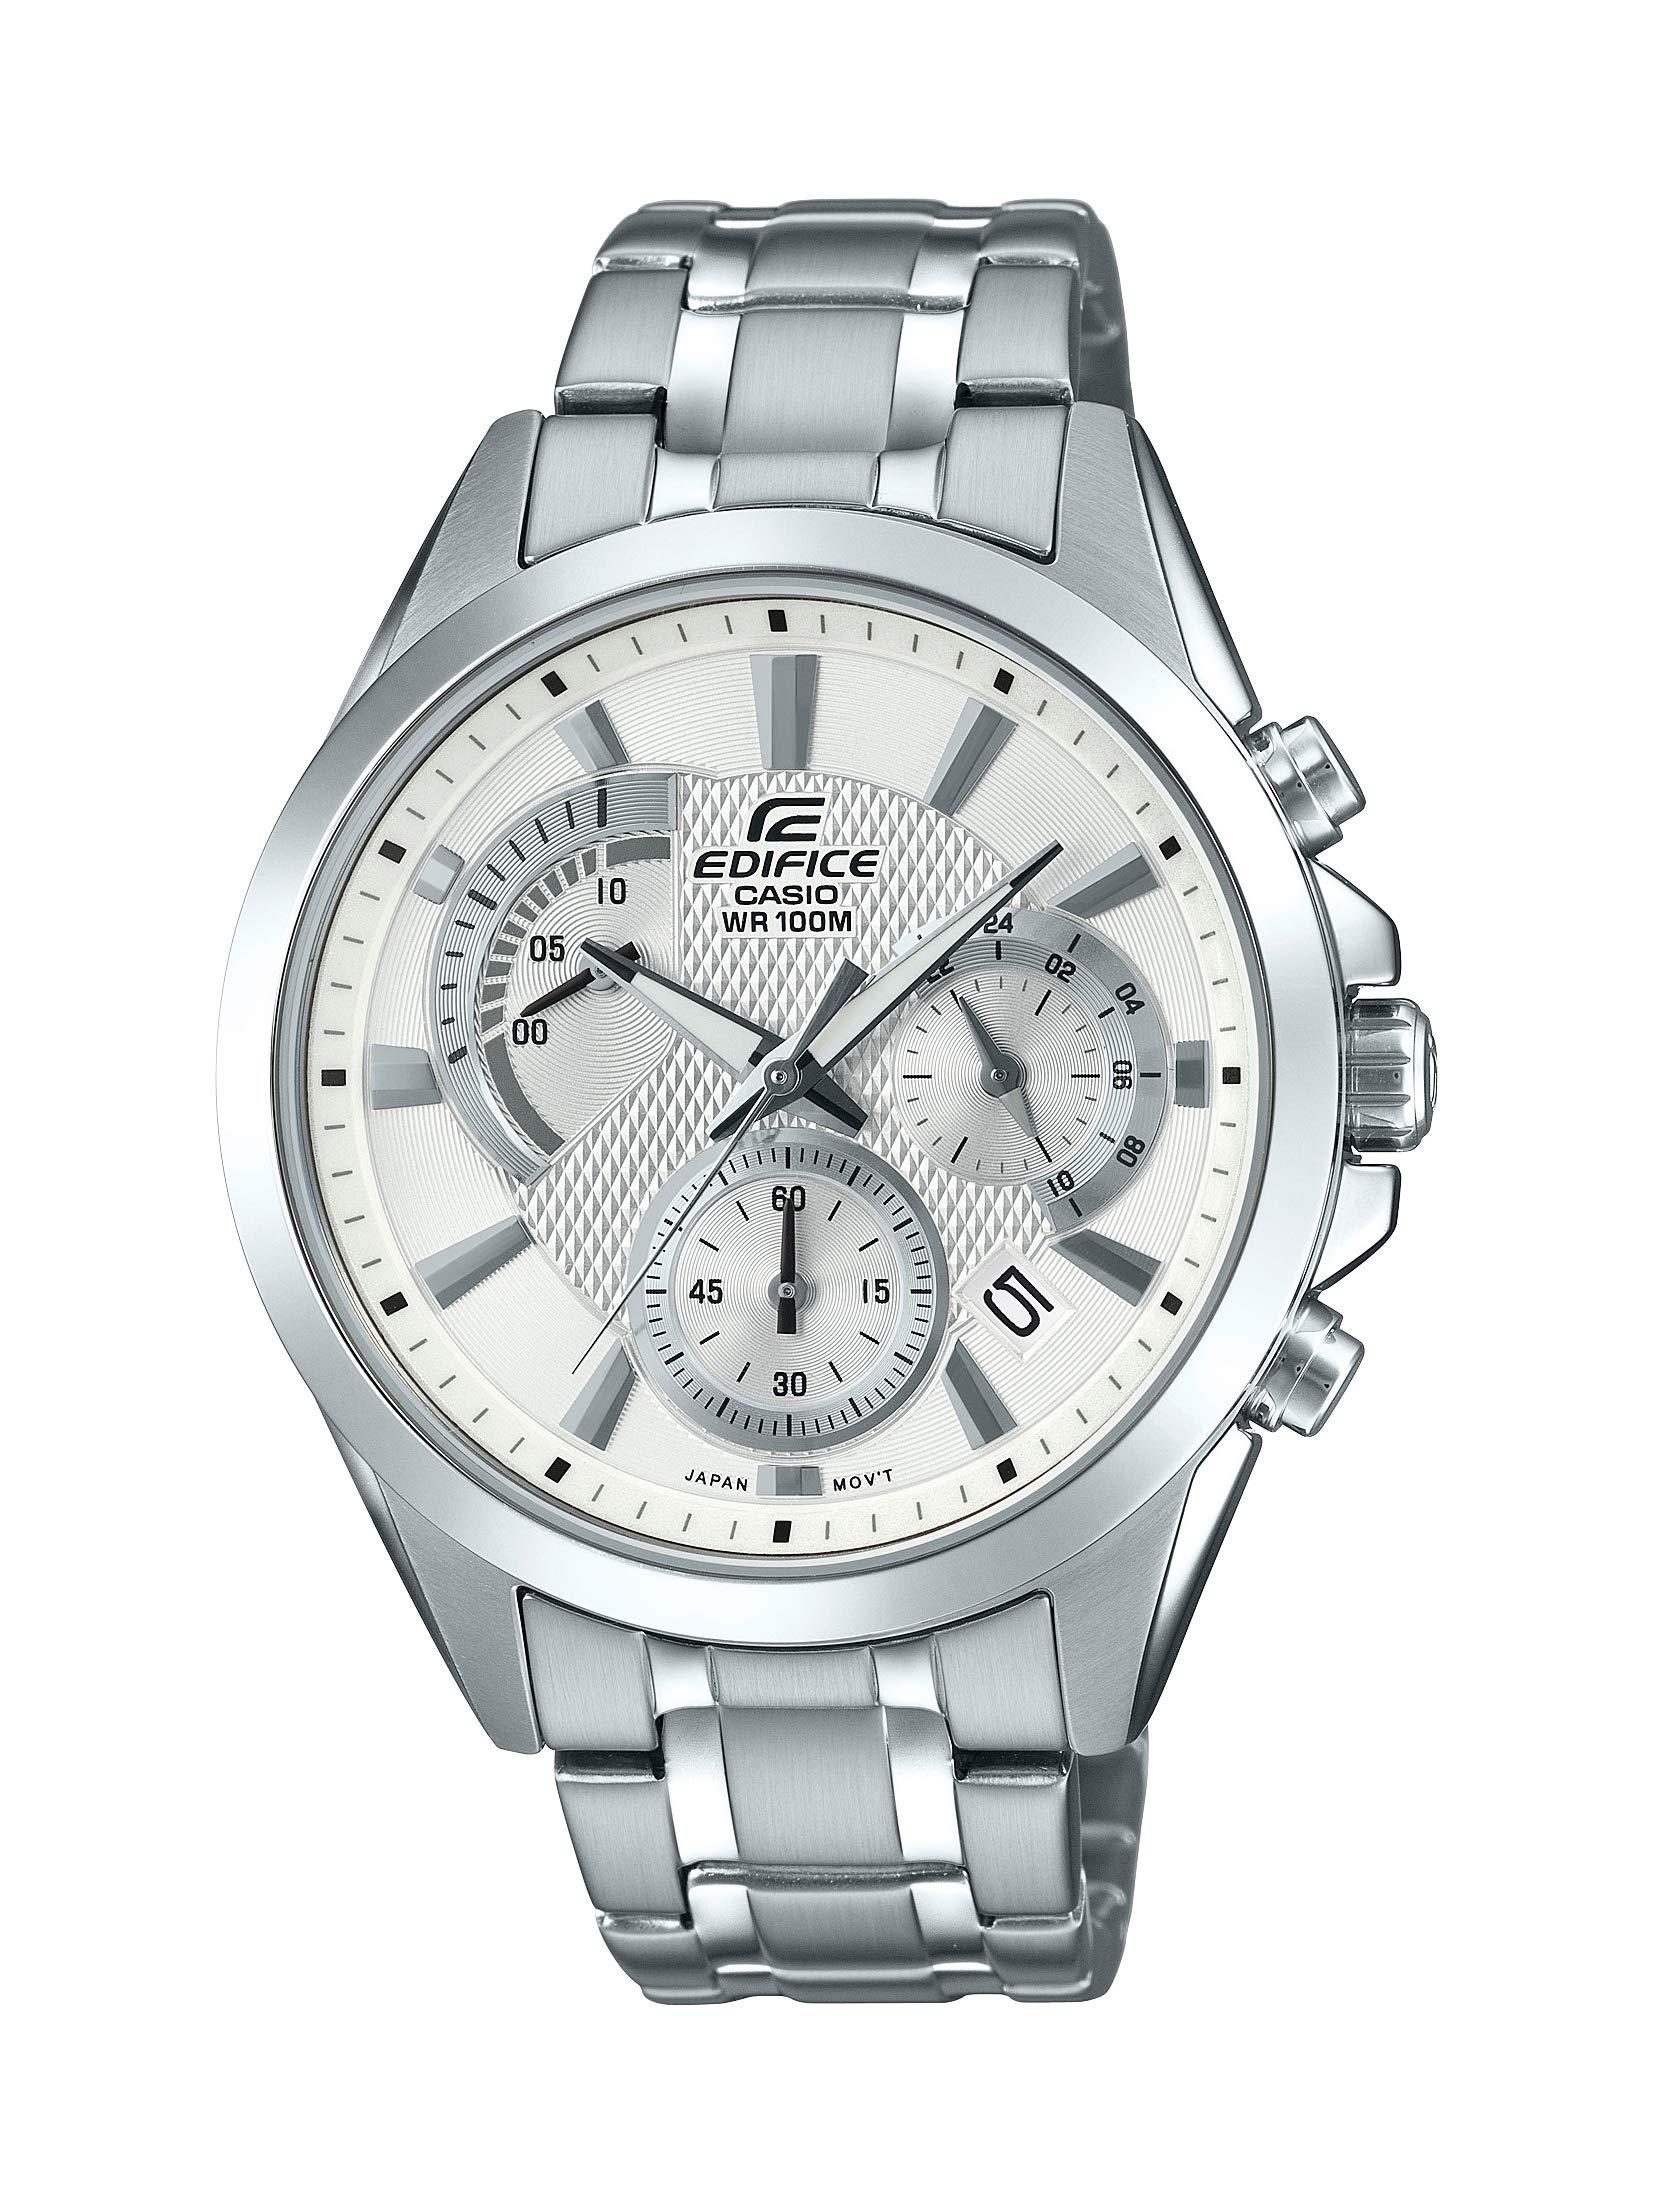 Casio Men's Edifice Silver Quartz Watch with Stainless-Steel Strap, 21.6 (Model: EFV-580D-7AVUDF)